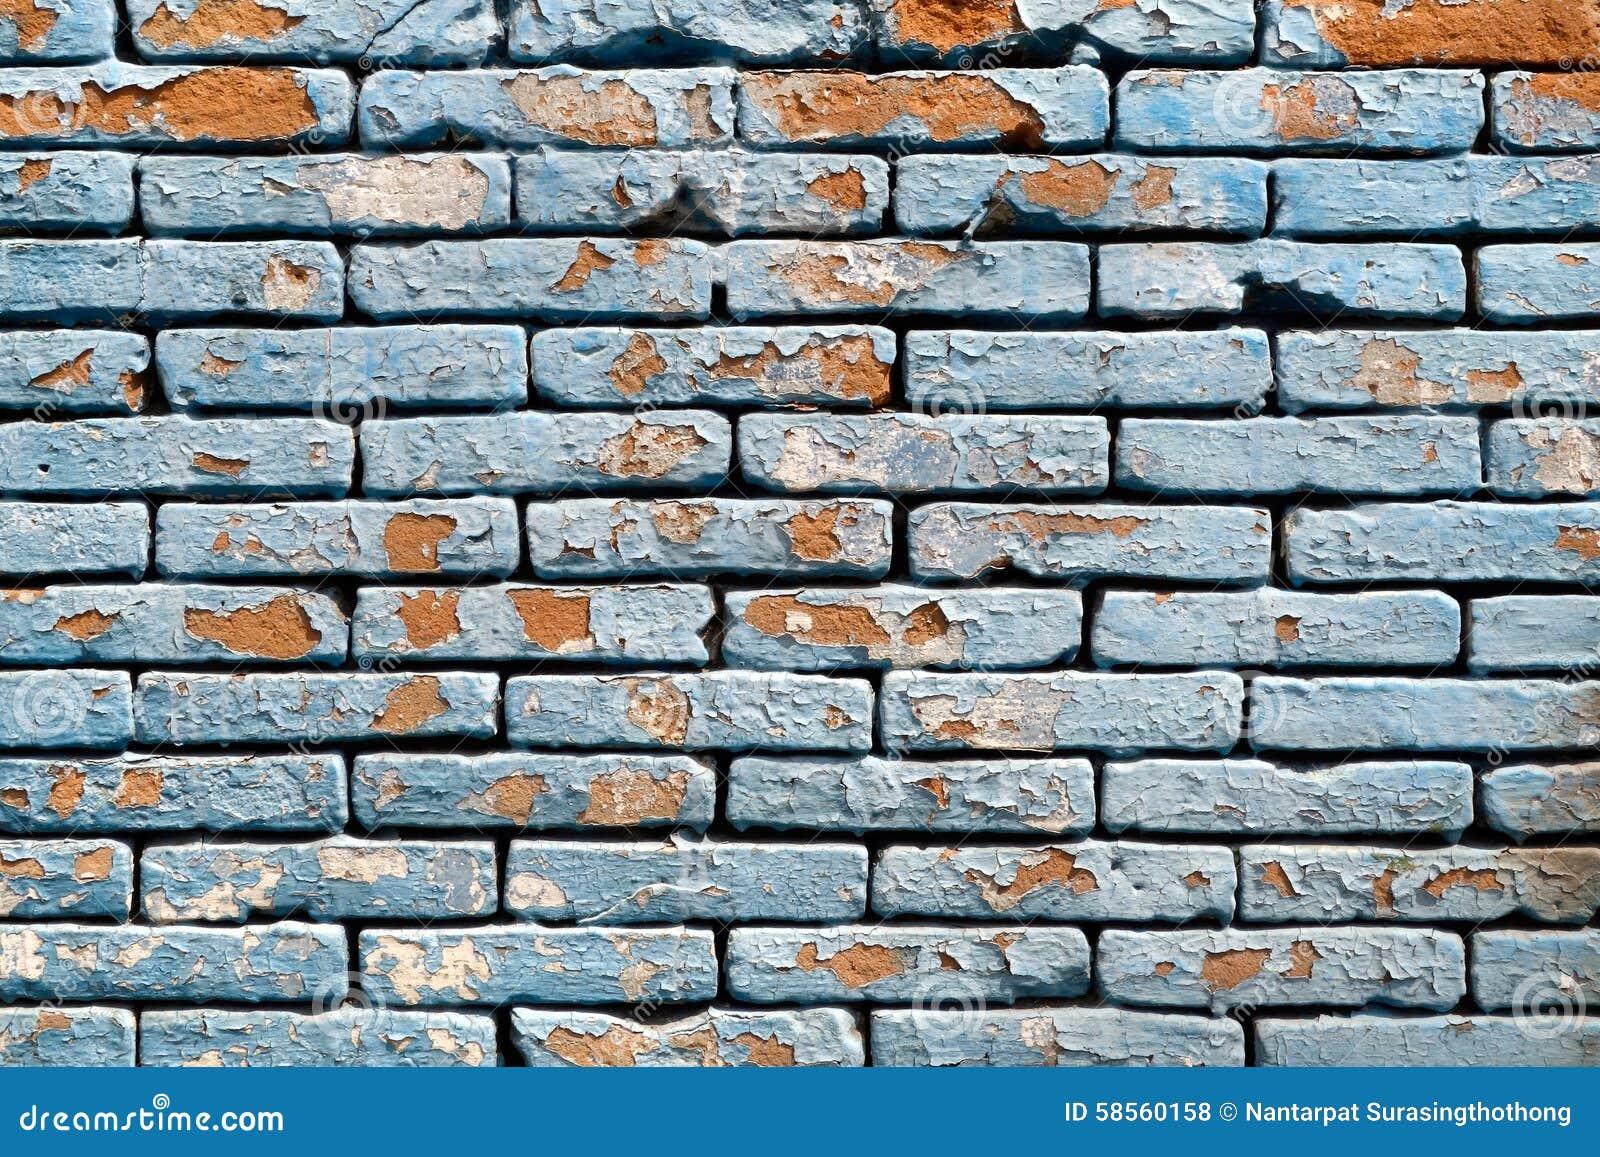 Peeling Paint Brick Wall Background Texture Stock Photo Image 58560158